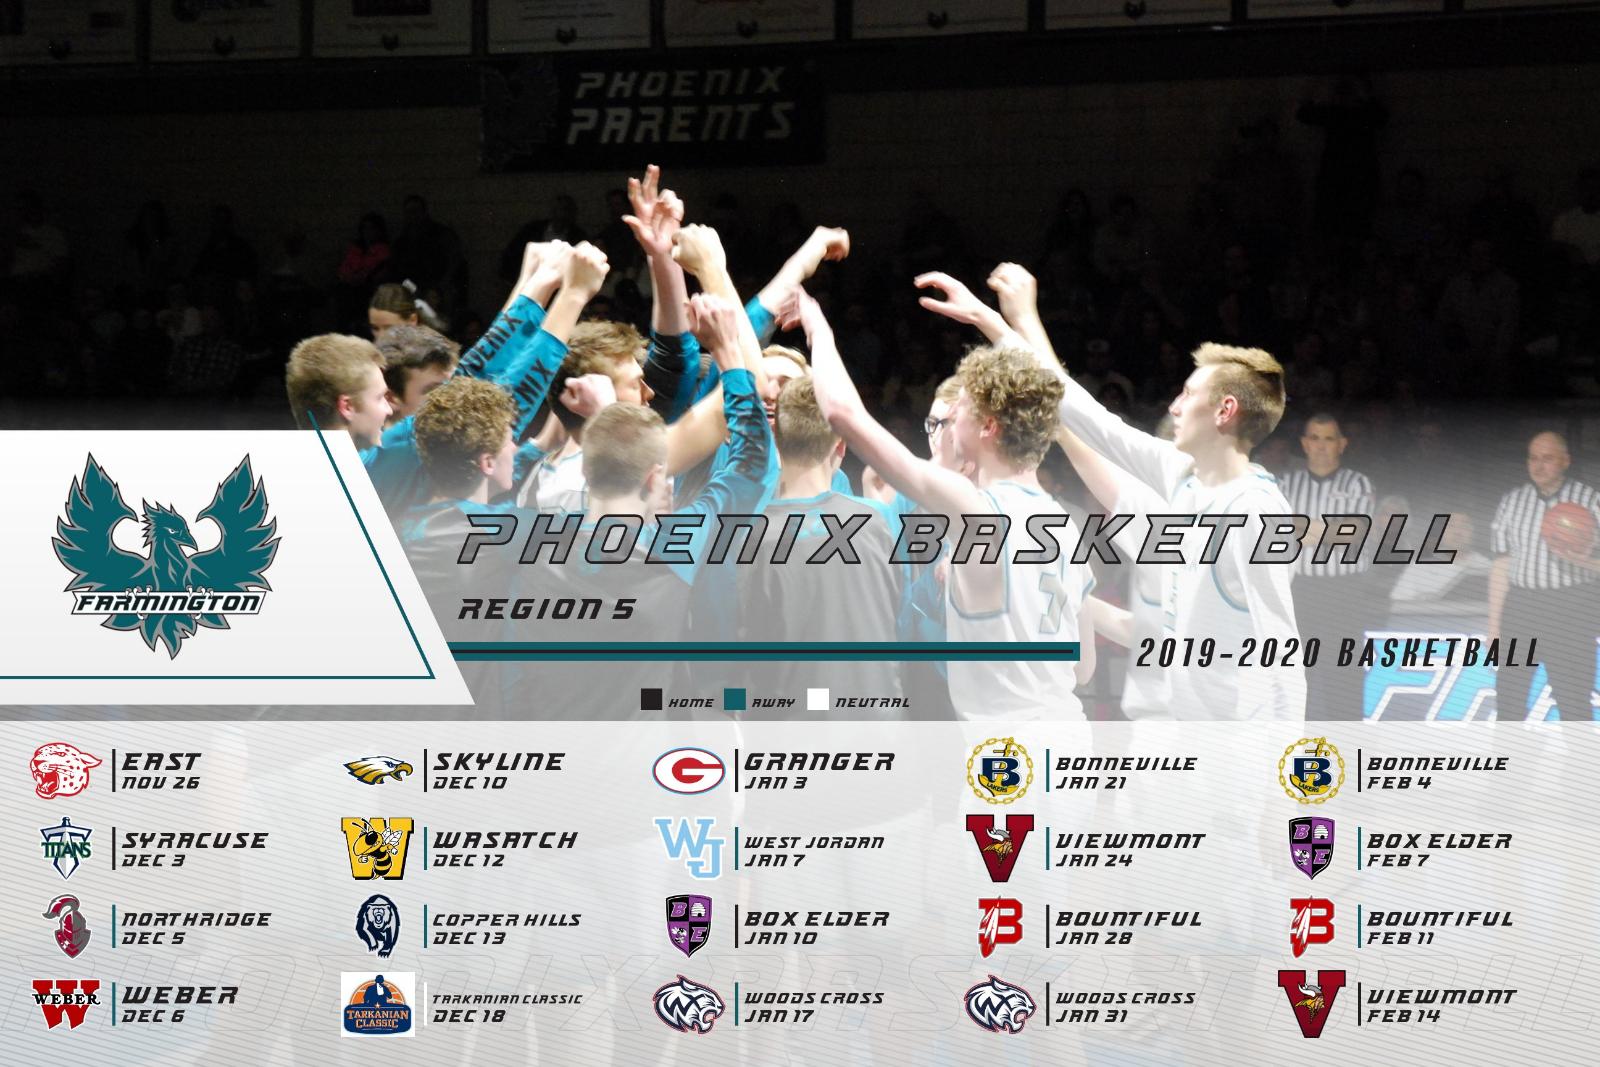 Boys Basketball Schedule